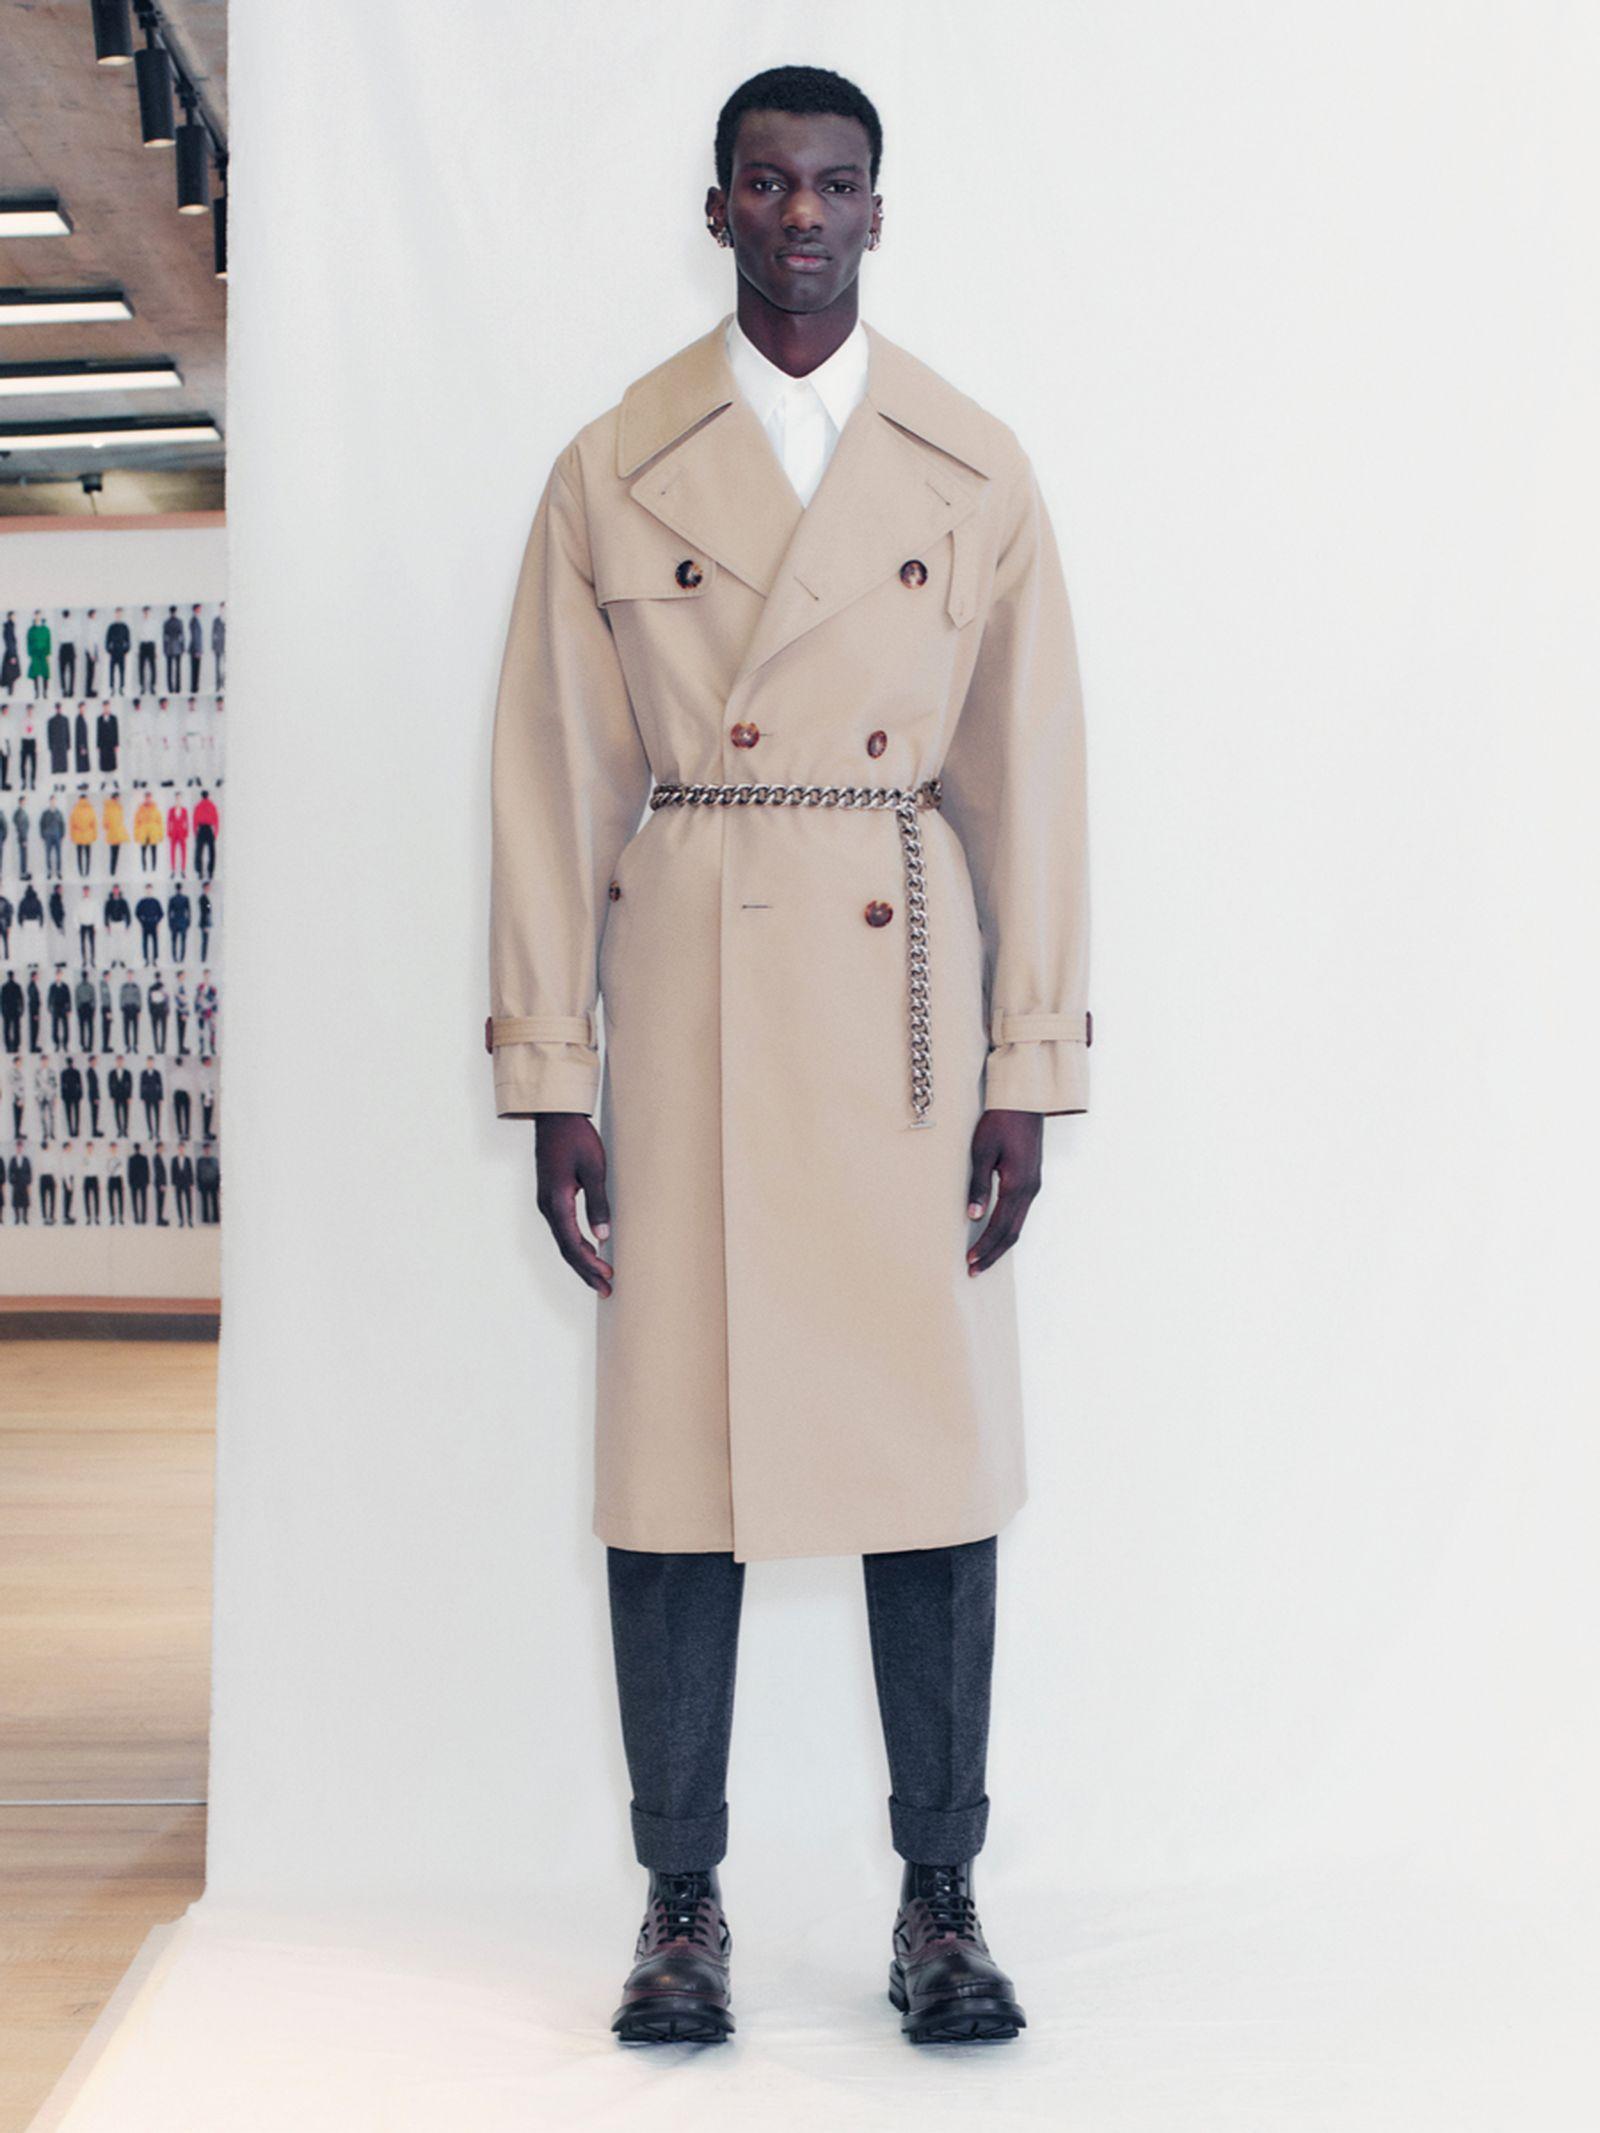 alexander-mcqueen-fall-winter-2021-collection- (21)